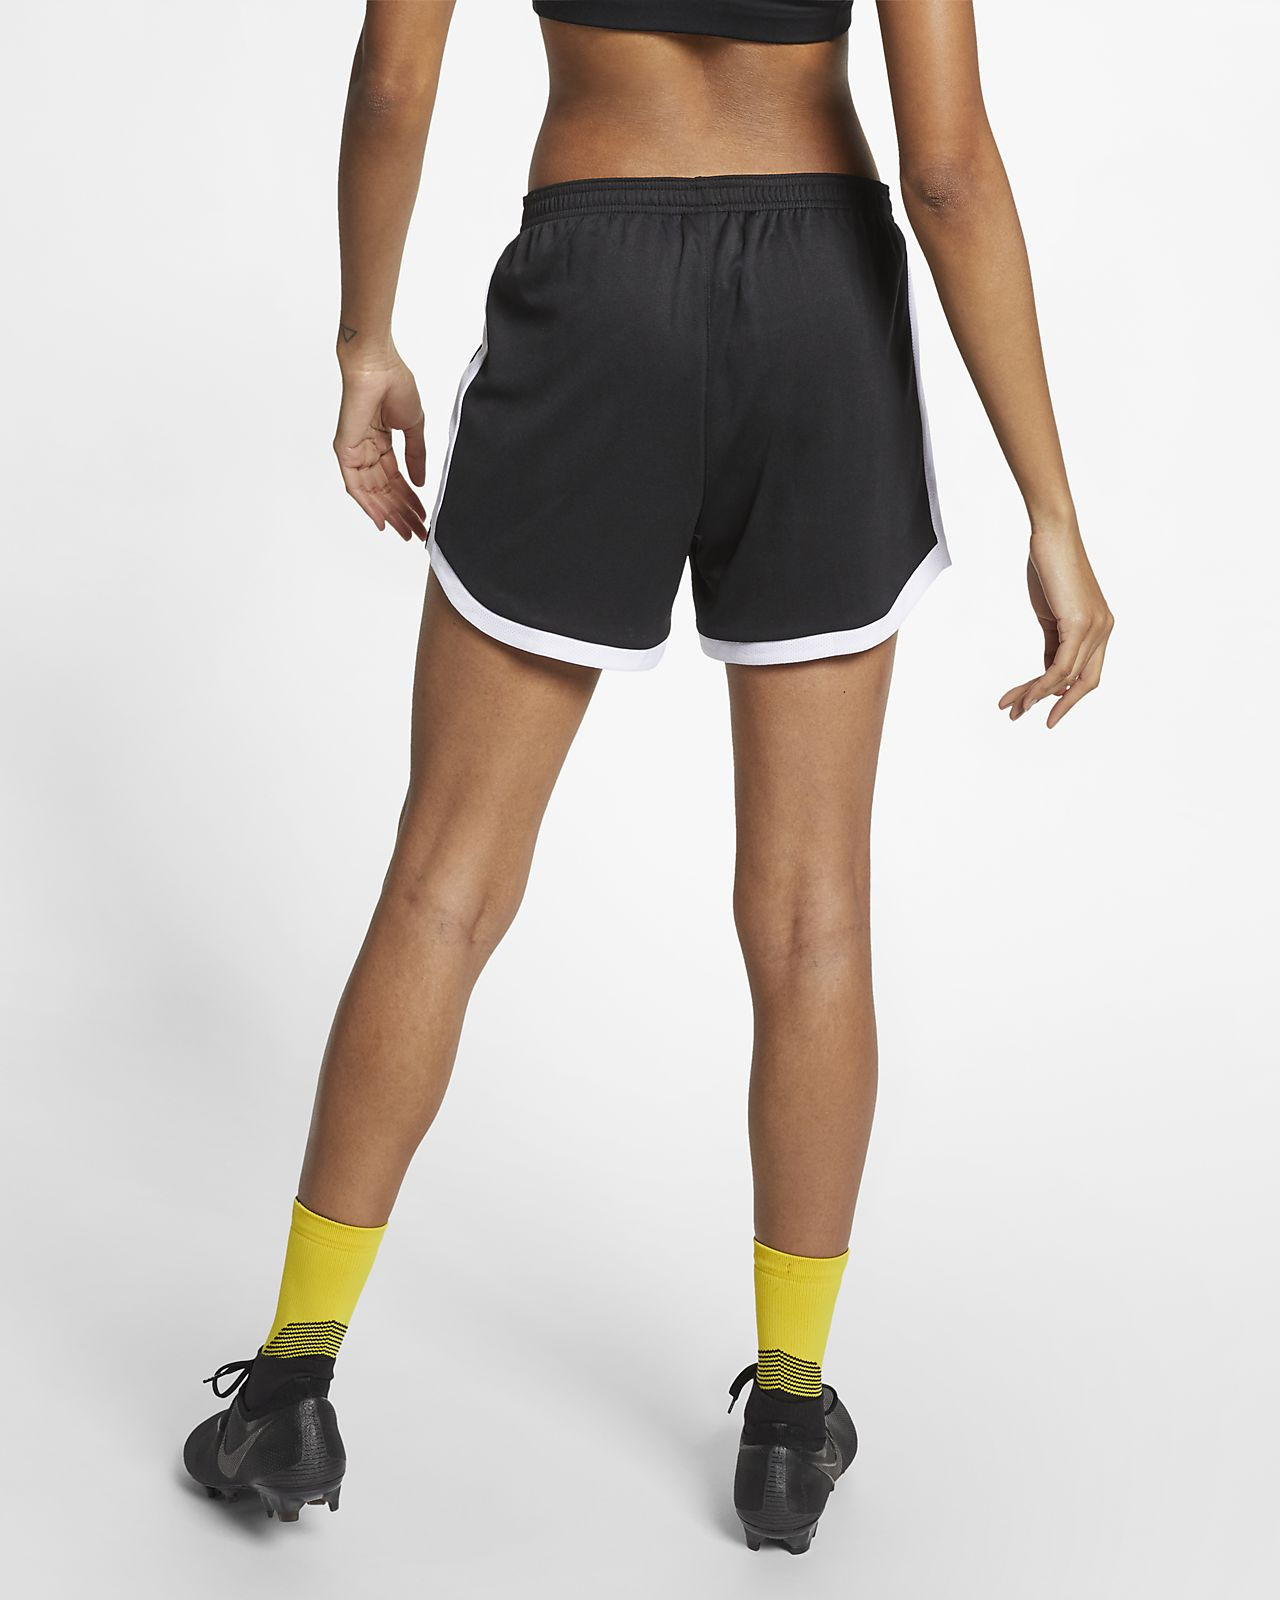 Women's Dri FIT Shorts. Nike CA